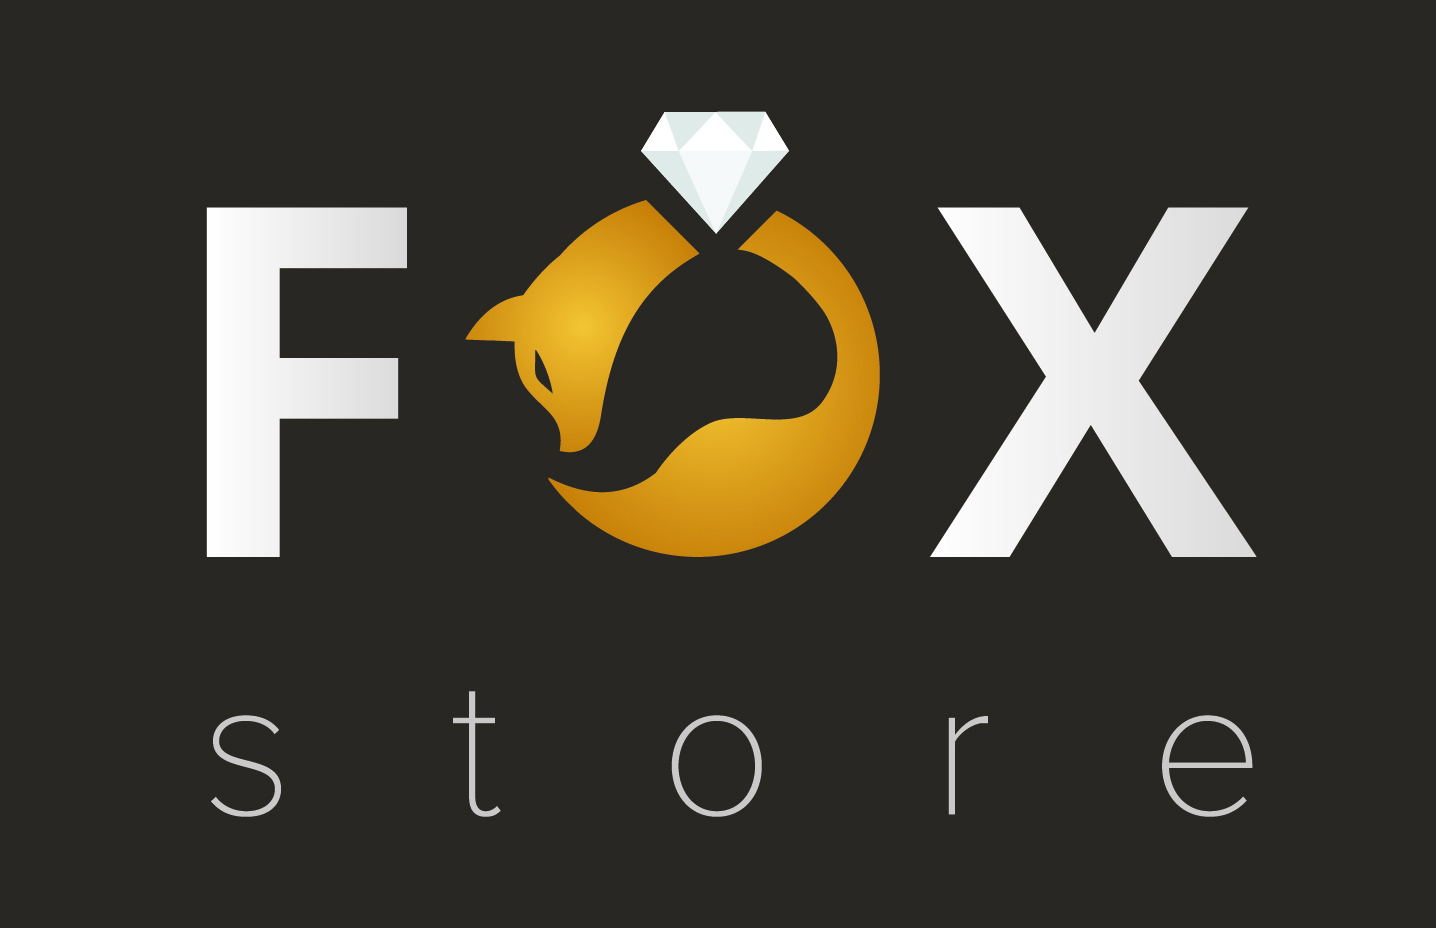 Fox Store Zlatnicky Dum Plzen Cesko Katalog Cz